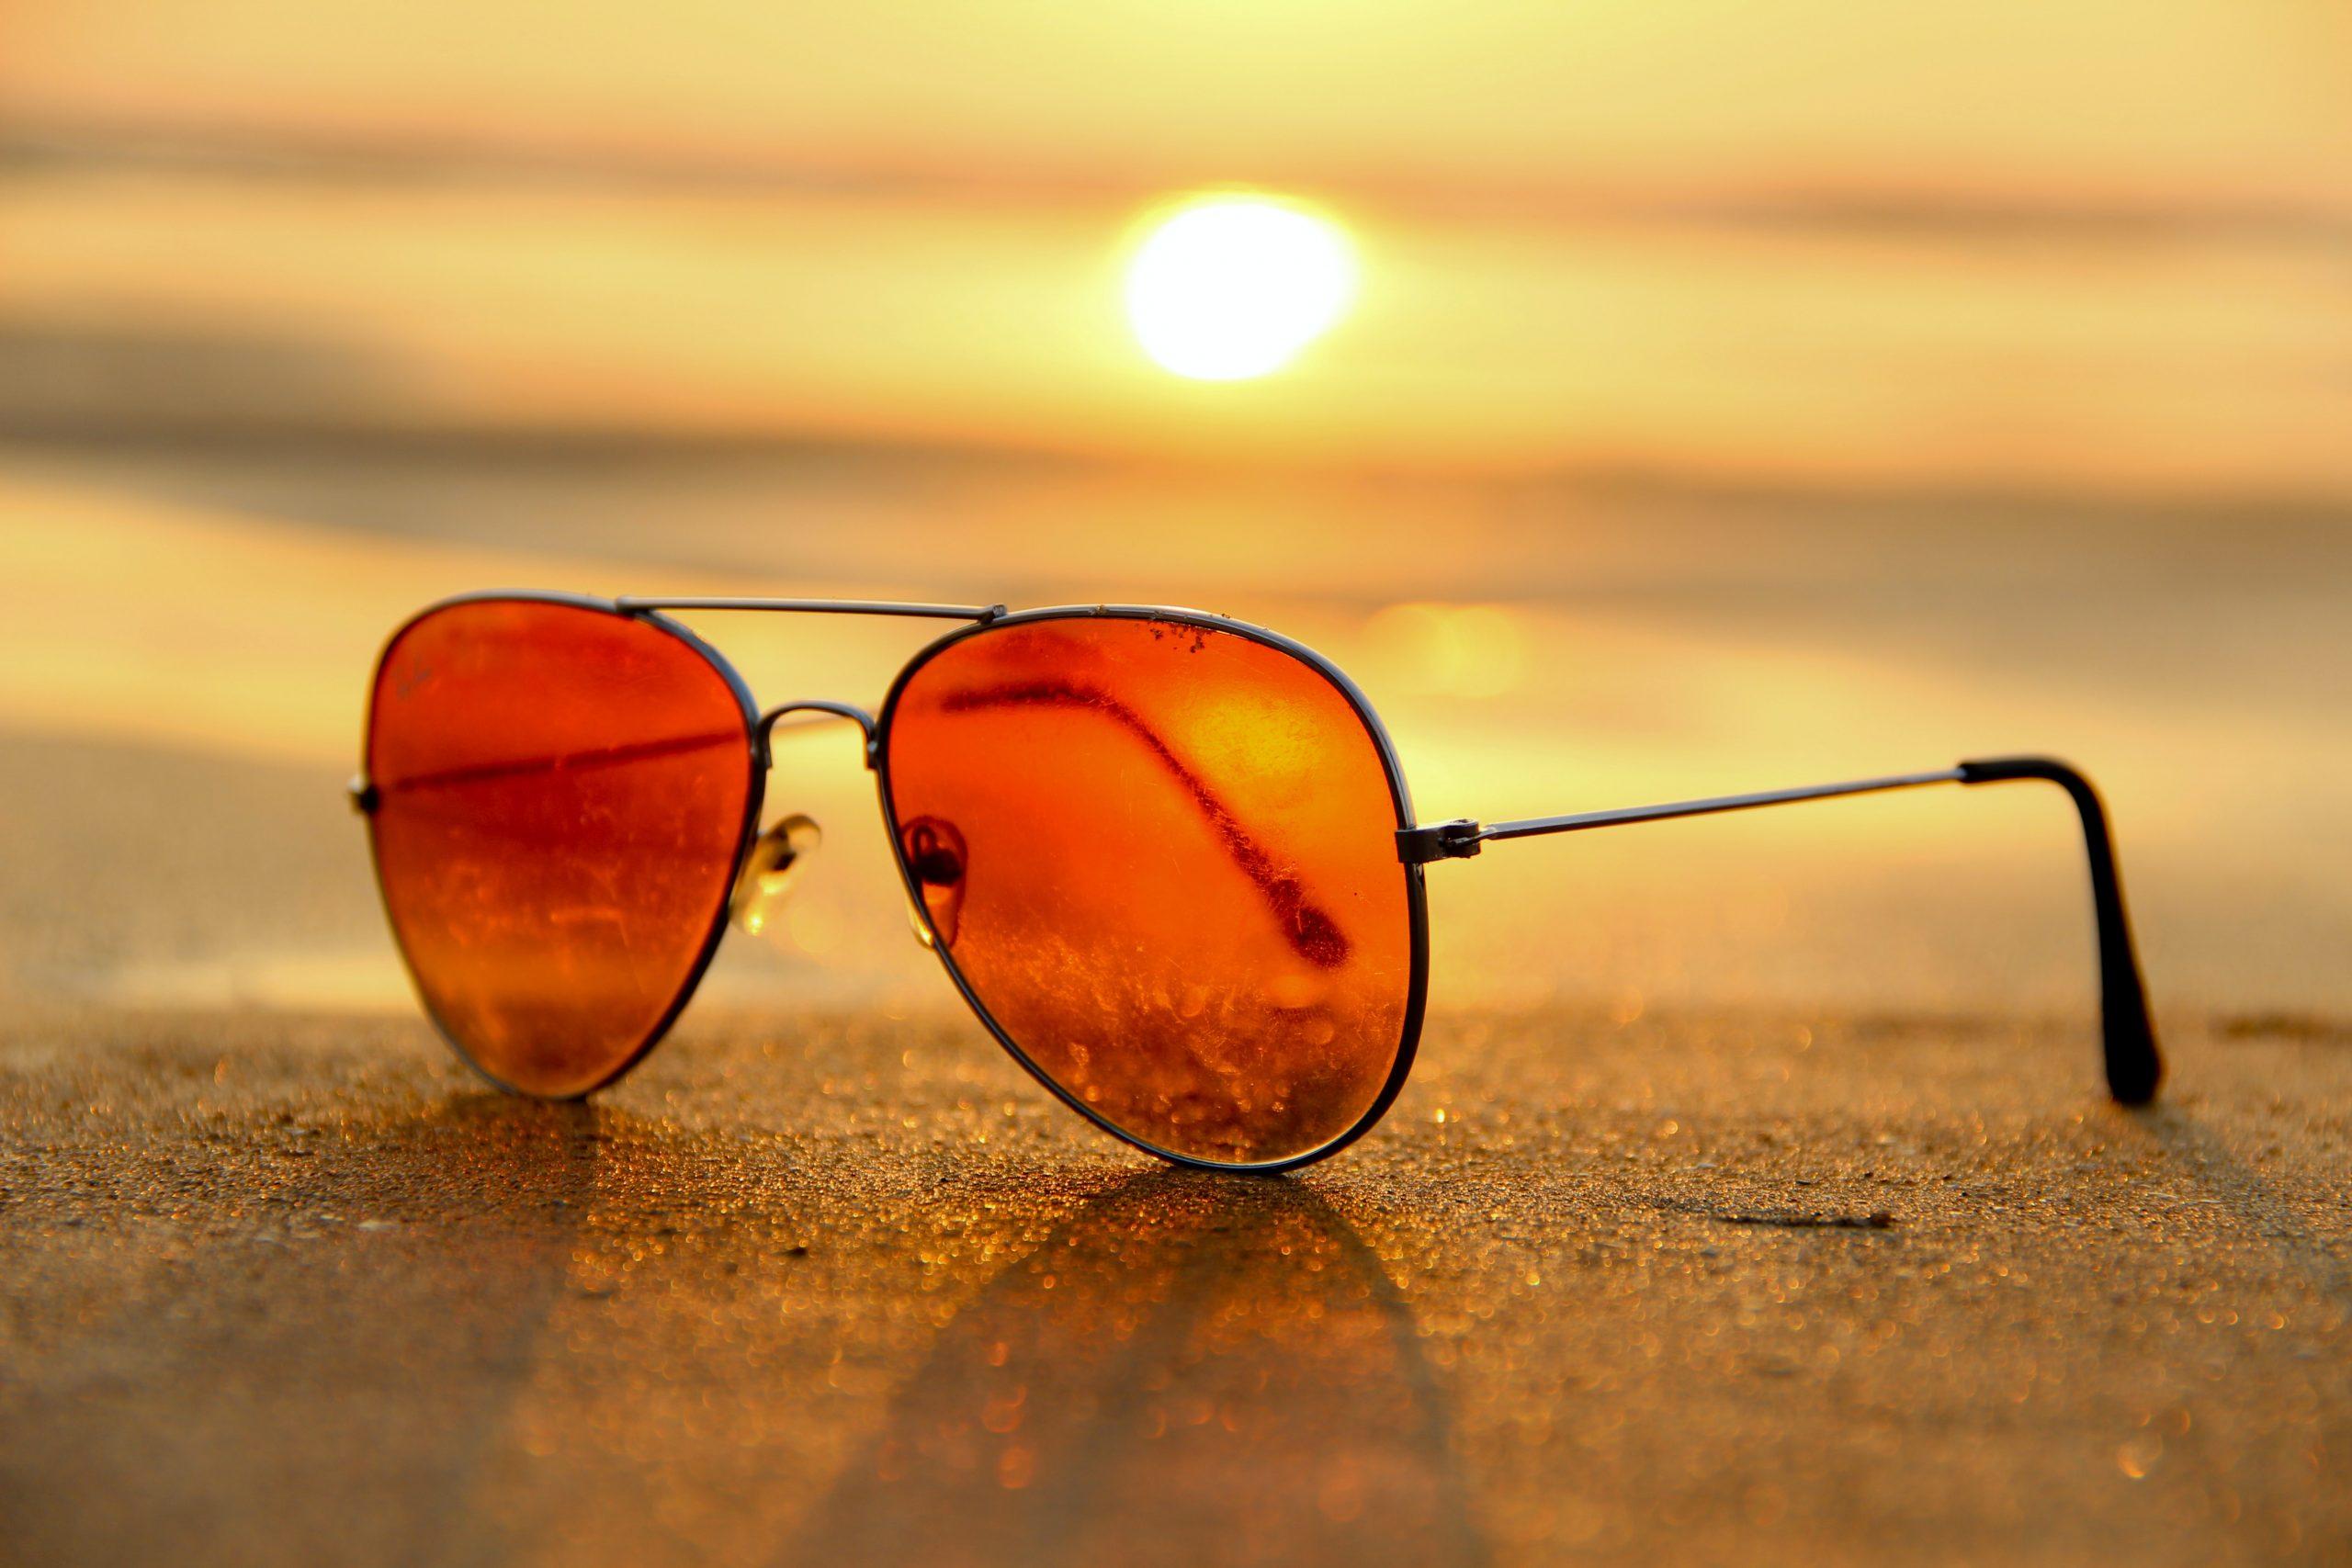 social media stats during Coronavirus graph on a laptop sunglasses-sunset-summer-sand